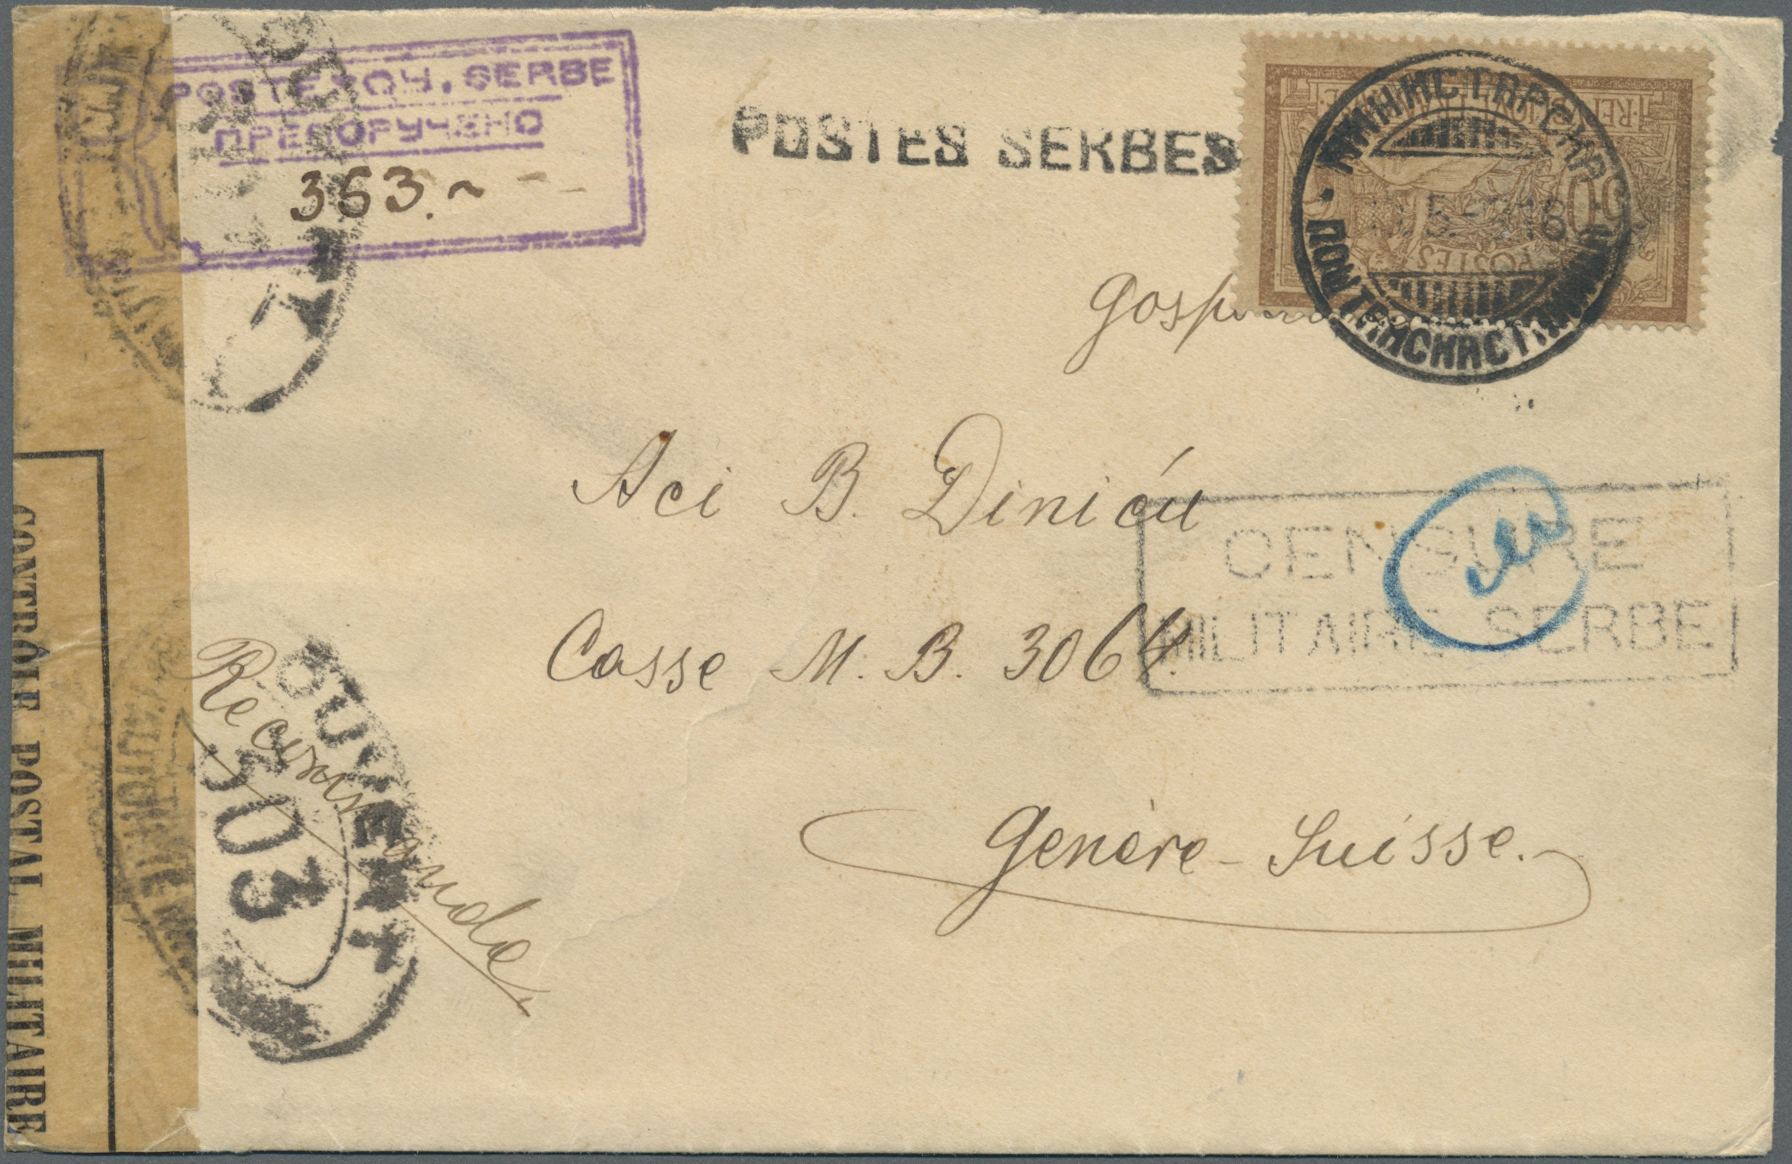 Lot 19018 - Serbien - Besonderheiten  -  Auktionshaus Christoph Gärtner GmbH & Co. KG Single lots Philately Overseas & Europe. Auction #39 Day 4